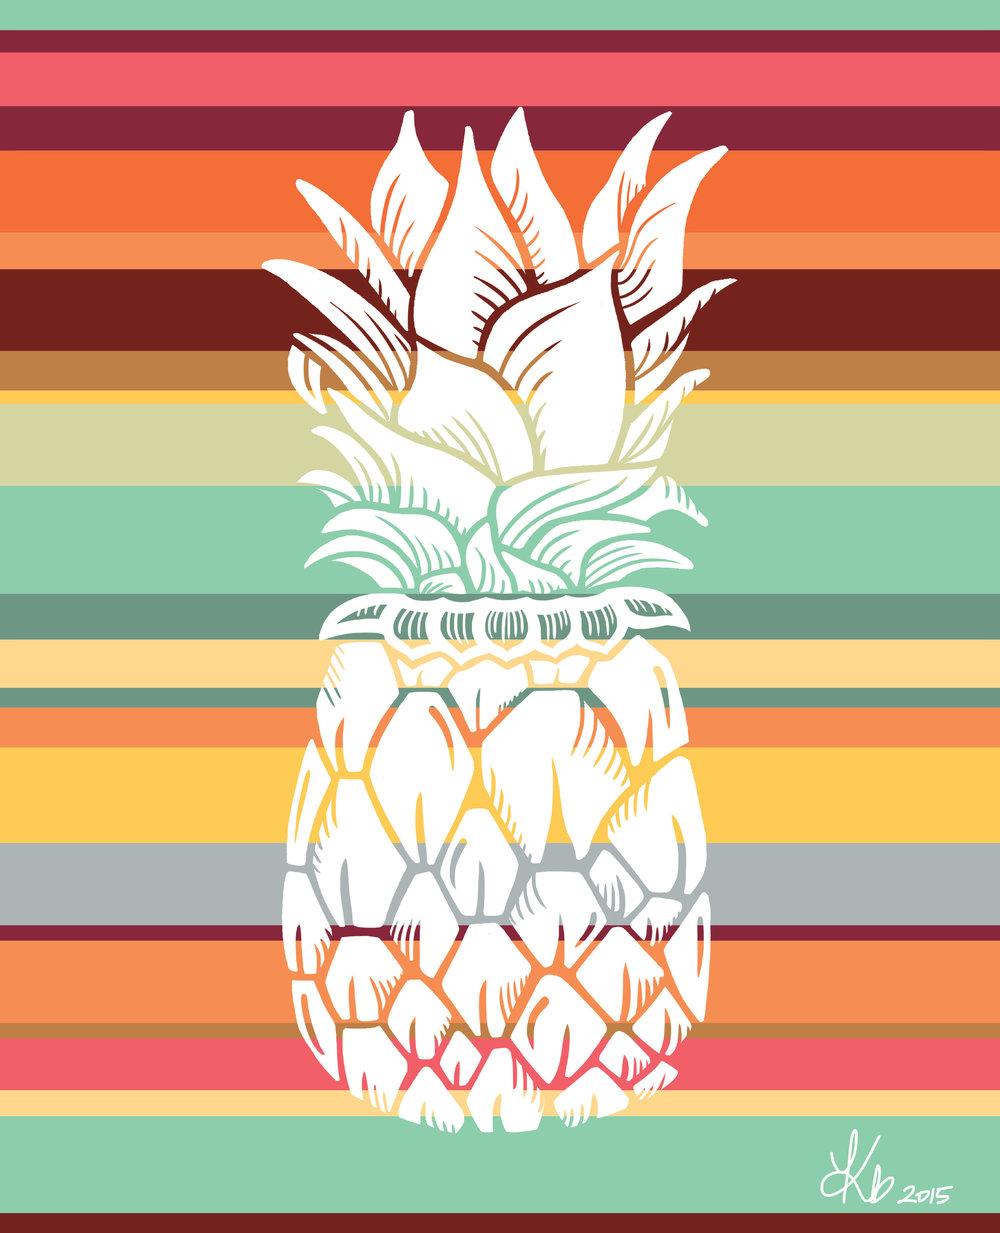 pineapple_8x10_rgb.jpg